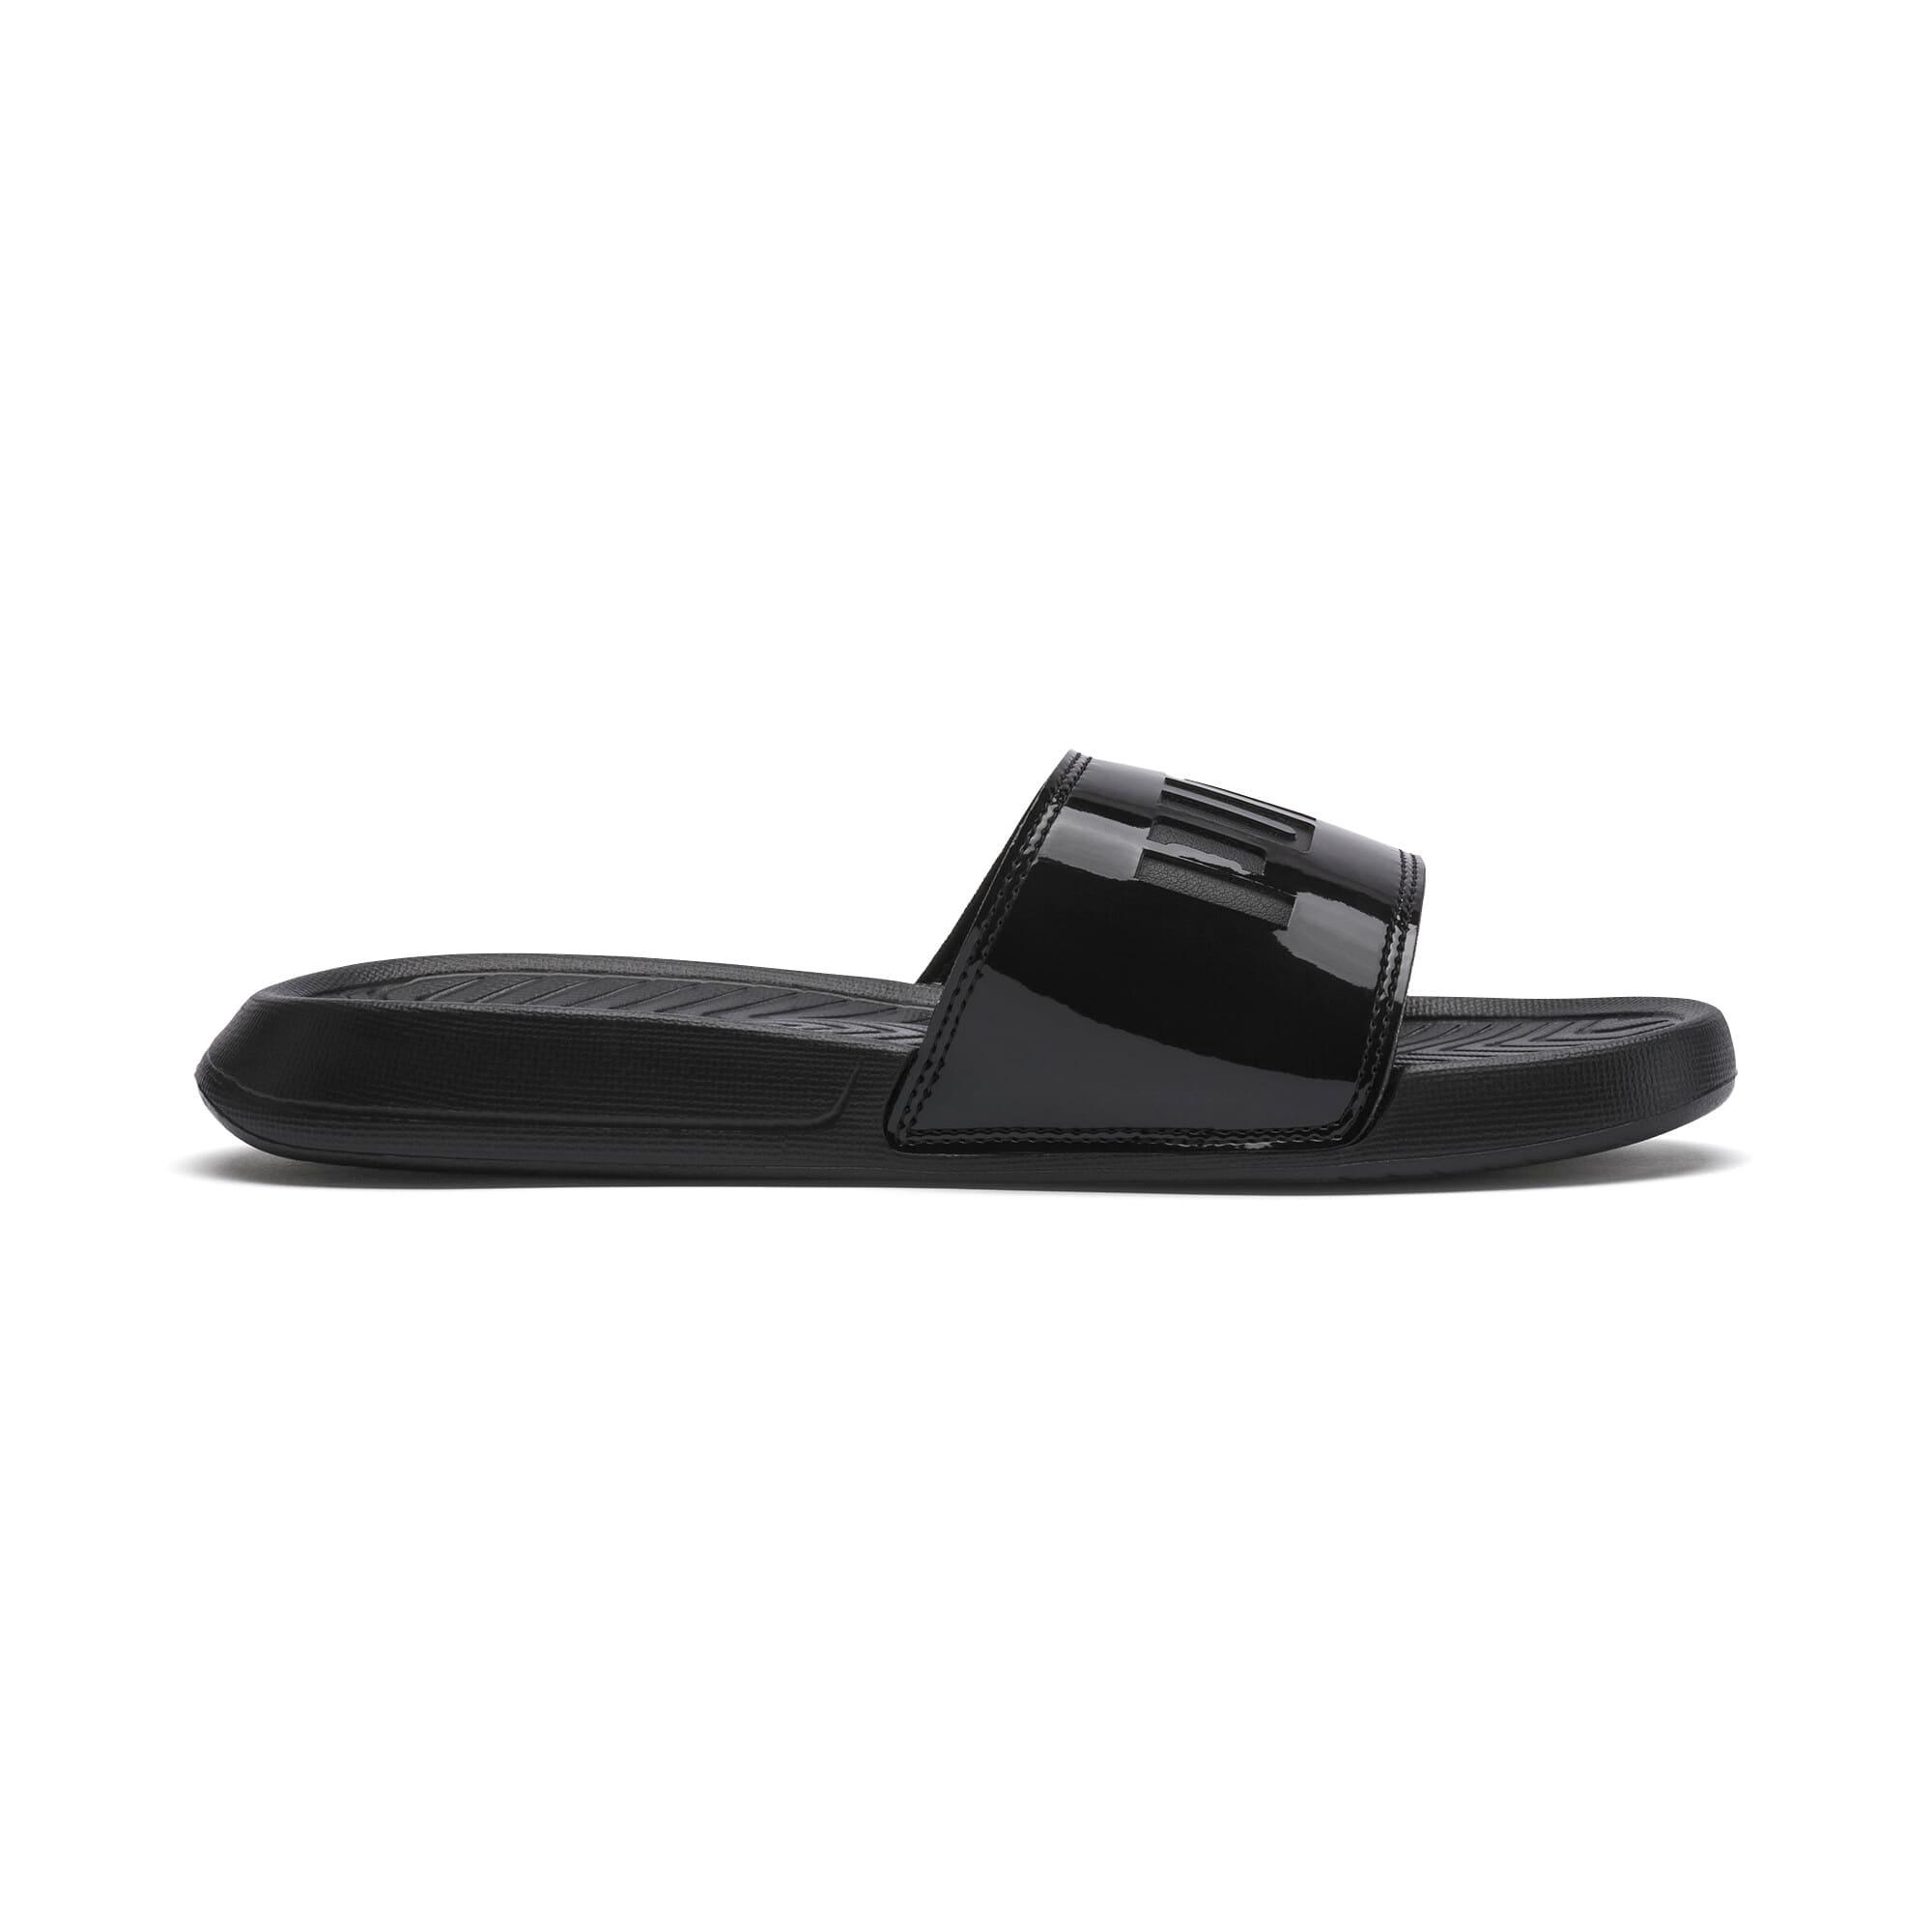 Thumbnail 5 of Popcat Patent Women's Sandals, Puma Black-Puma Black, medium